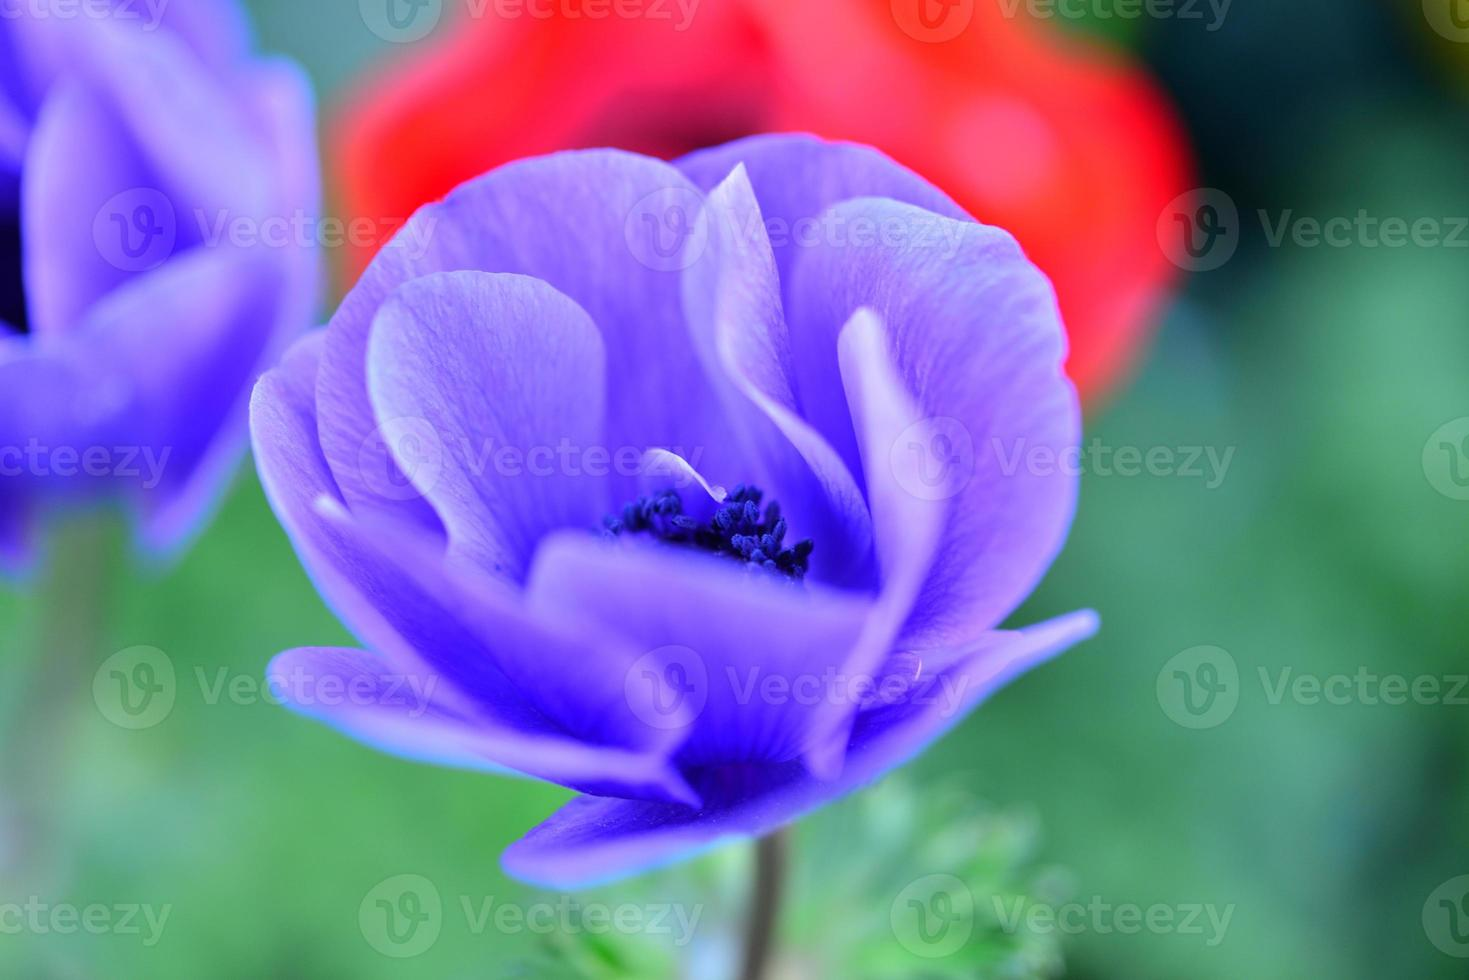 anemoon bloem foto